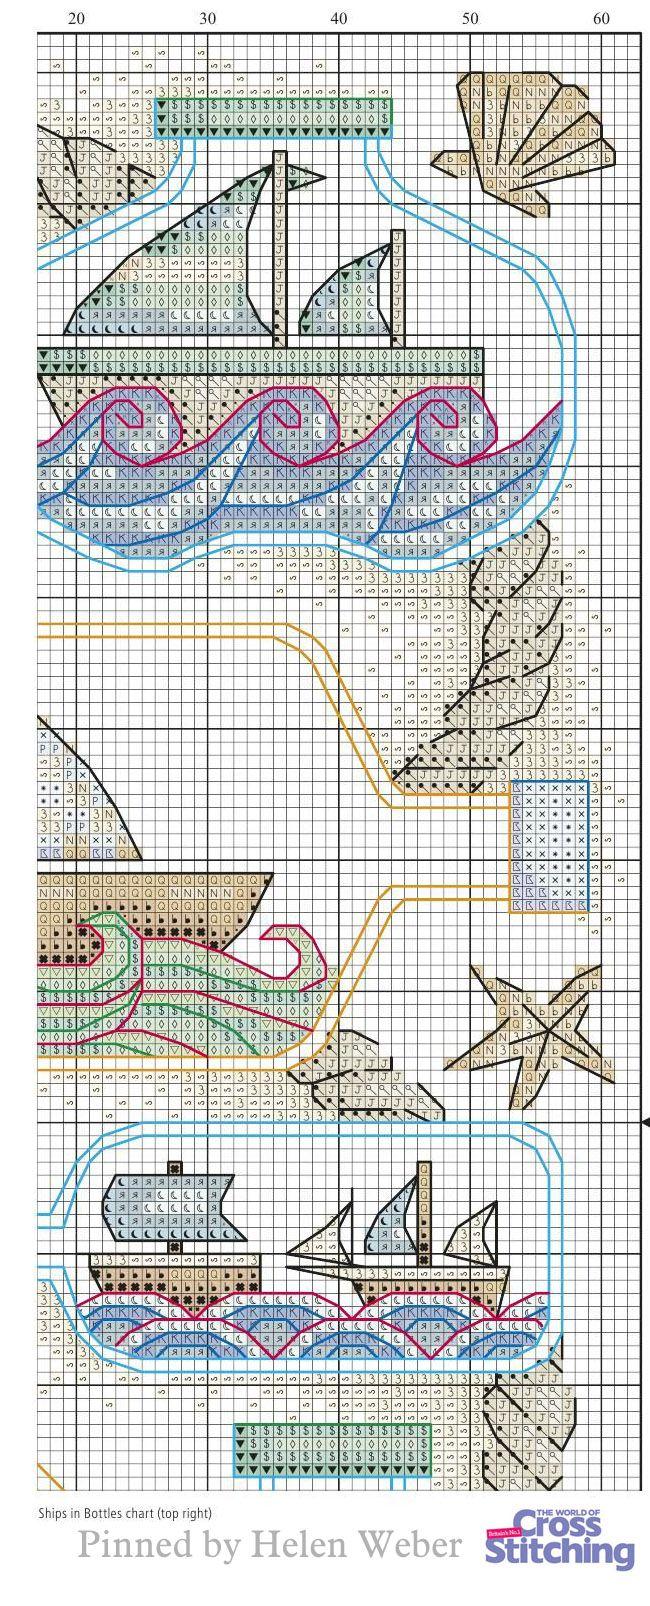 Ships In Bottles Stitch Patterns Cross Stitch Cross Stitch Patterns